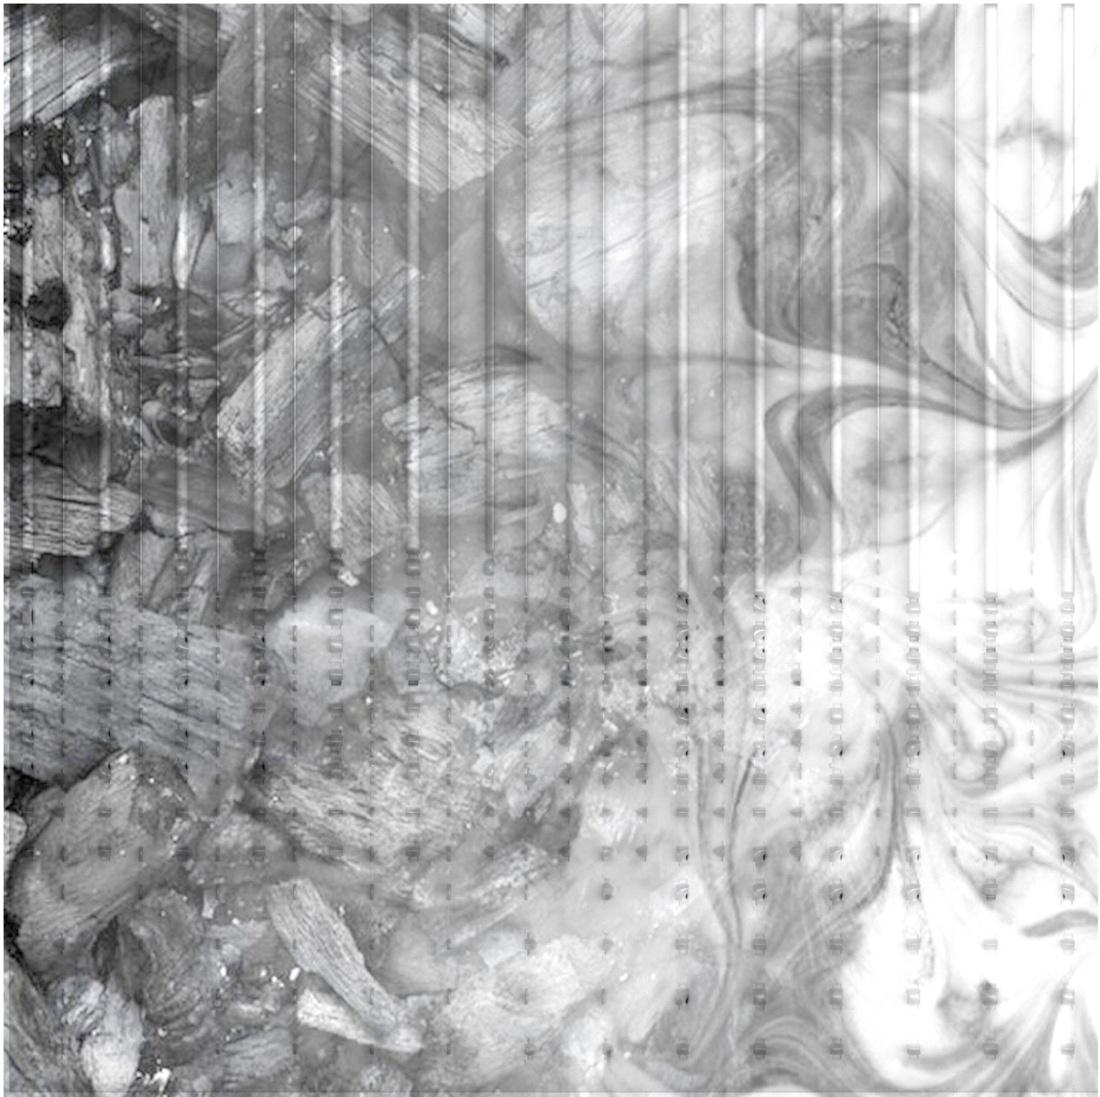 Texture by Michelle Badr, Kelley Johnson, Rosa Congdon, Alix Pauchet, and Miriam Dreiblatt